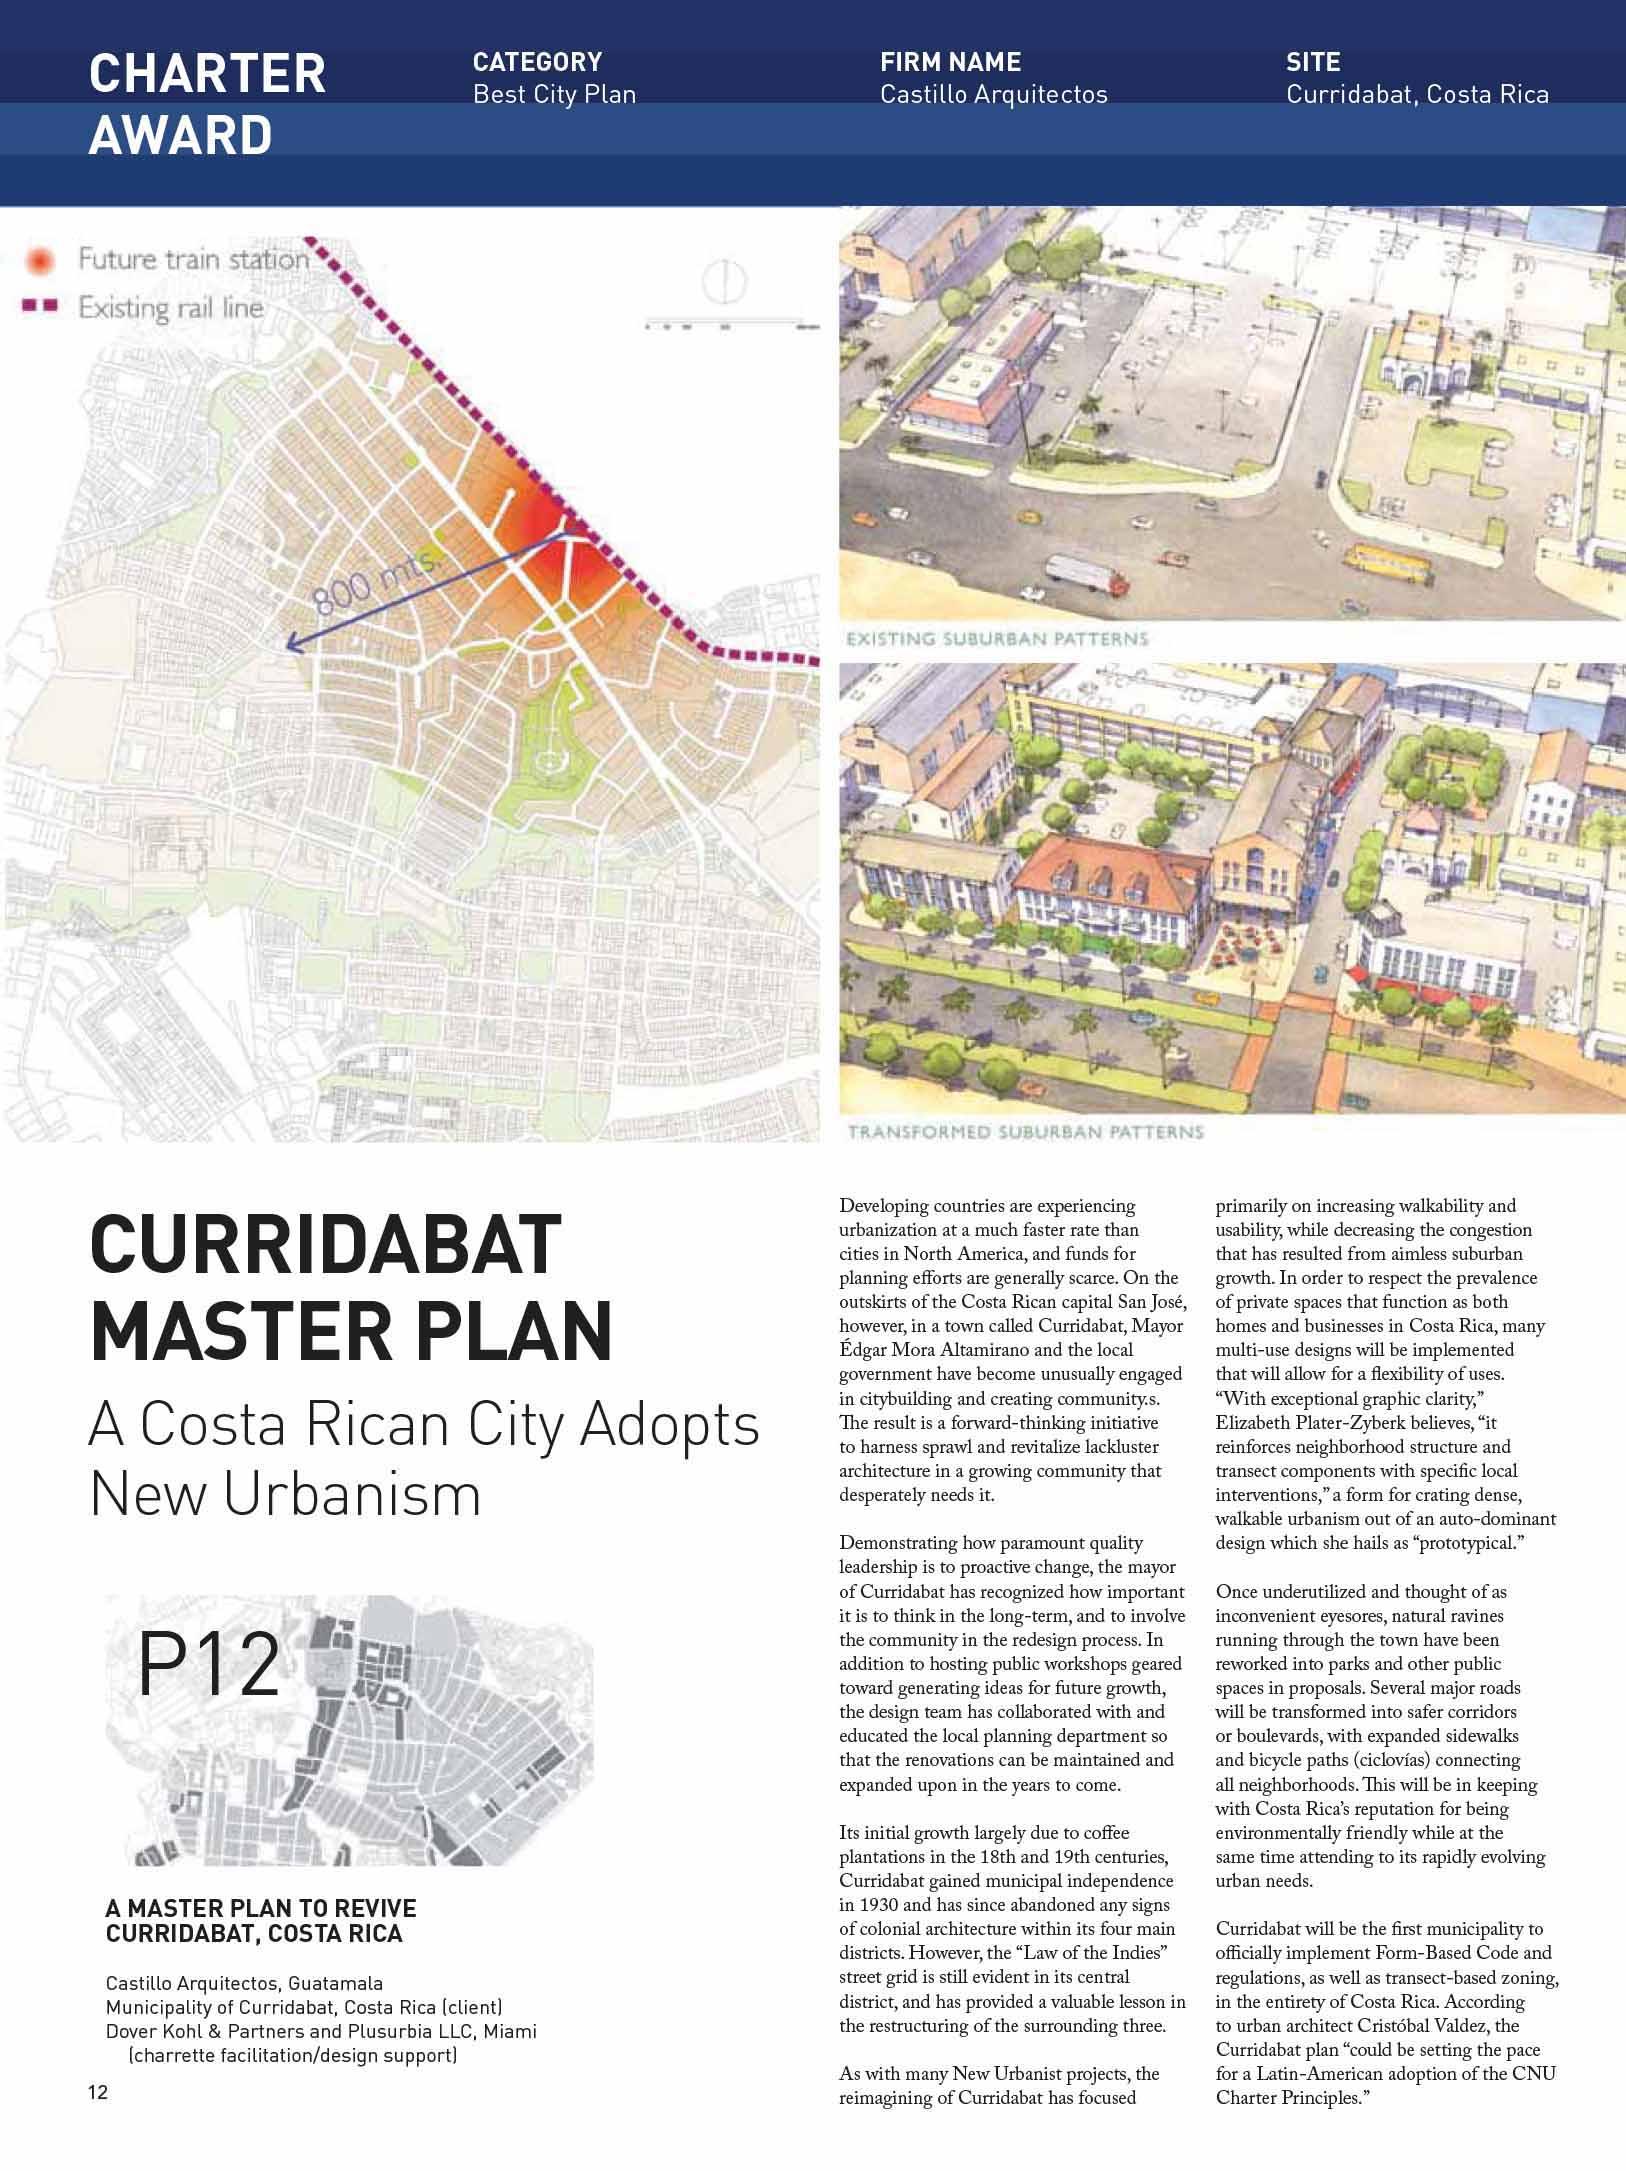 2014-Best City Plan CNU Charter Award- Curridabat Master Plan with Castillo Arquitectos-1.jpg